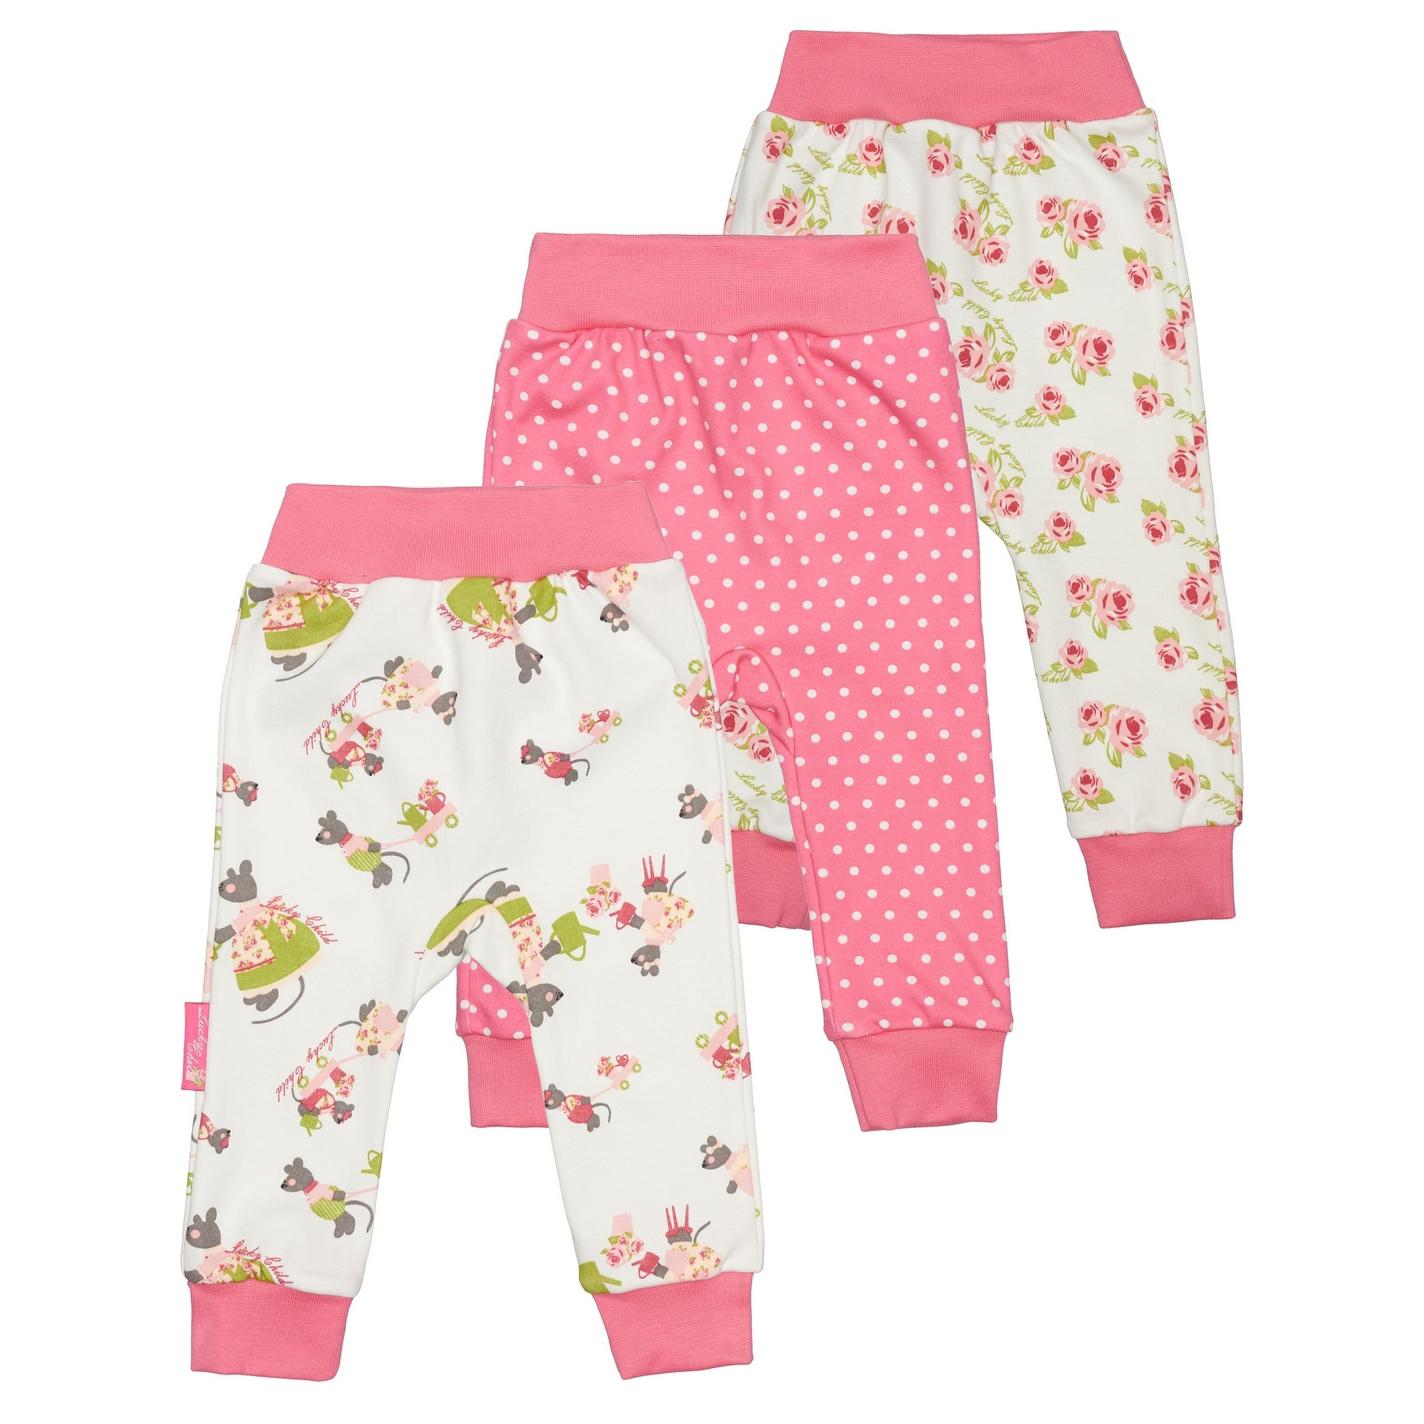 Комплект брюк Lucky Child Маленькая садовница 3 шт 80-86